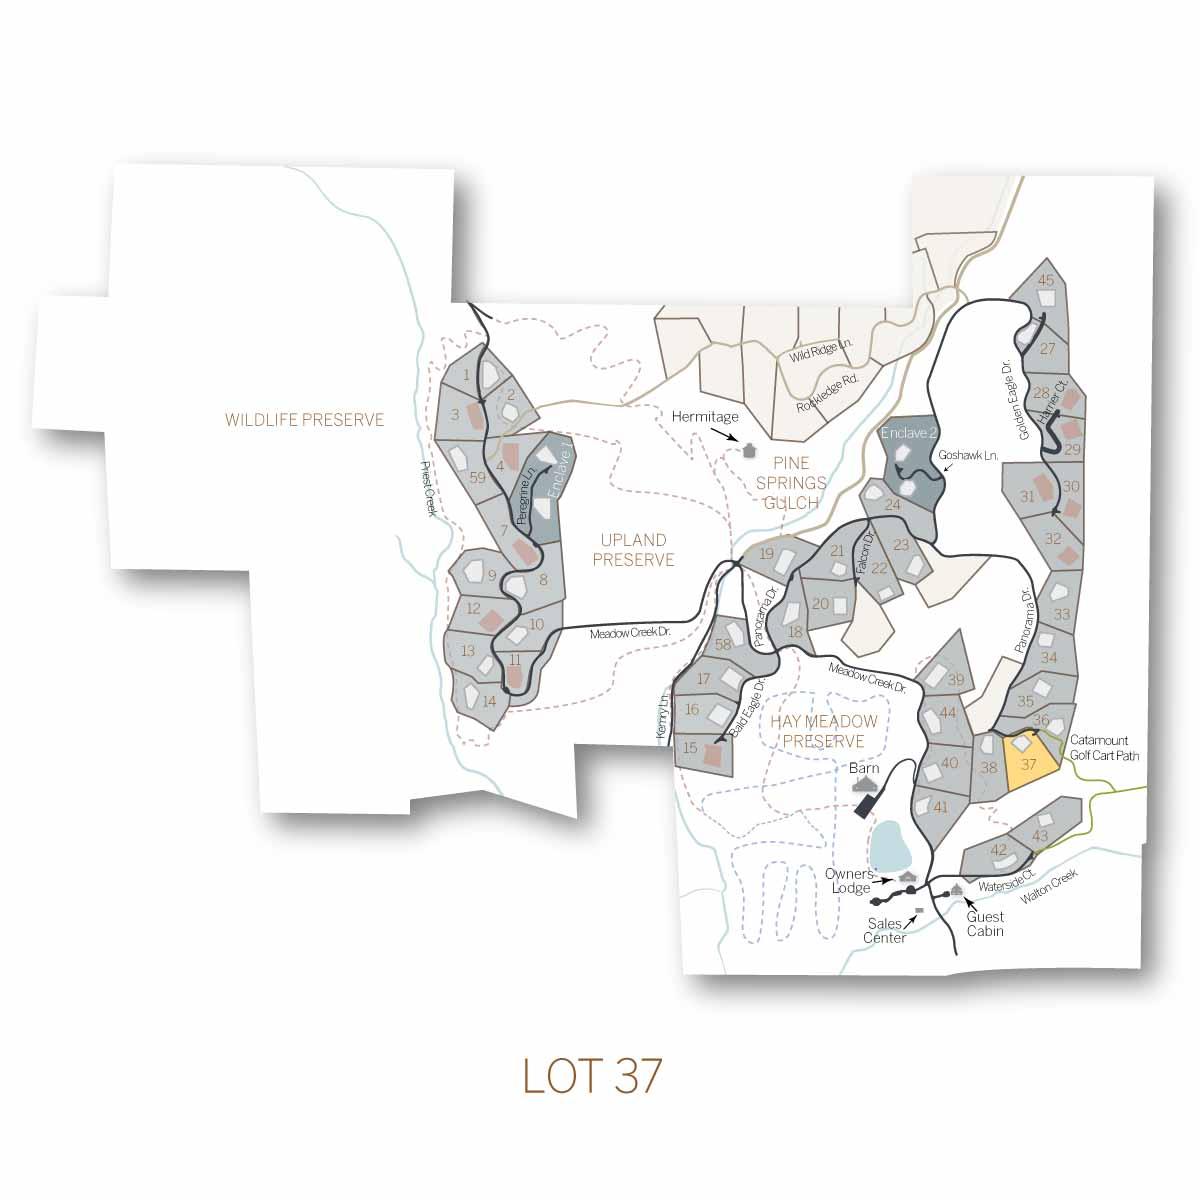 lot 37 1 - Homesite #37